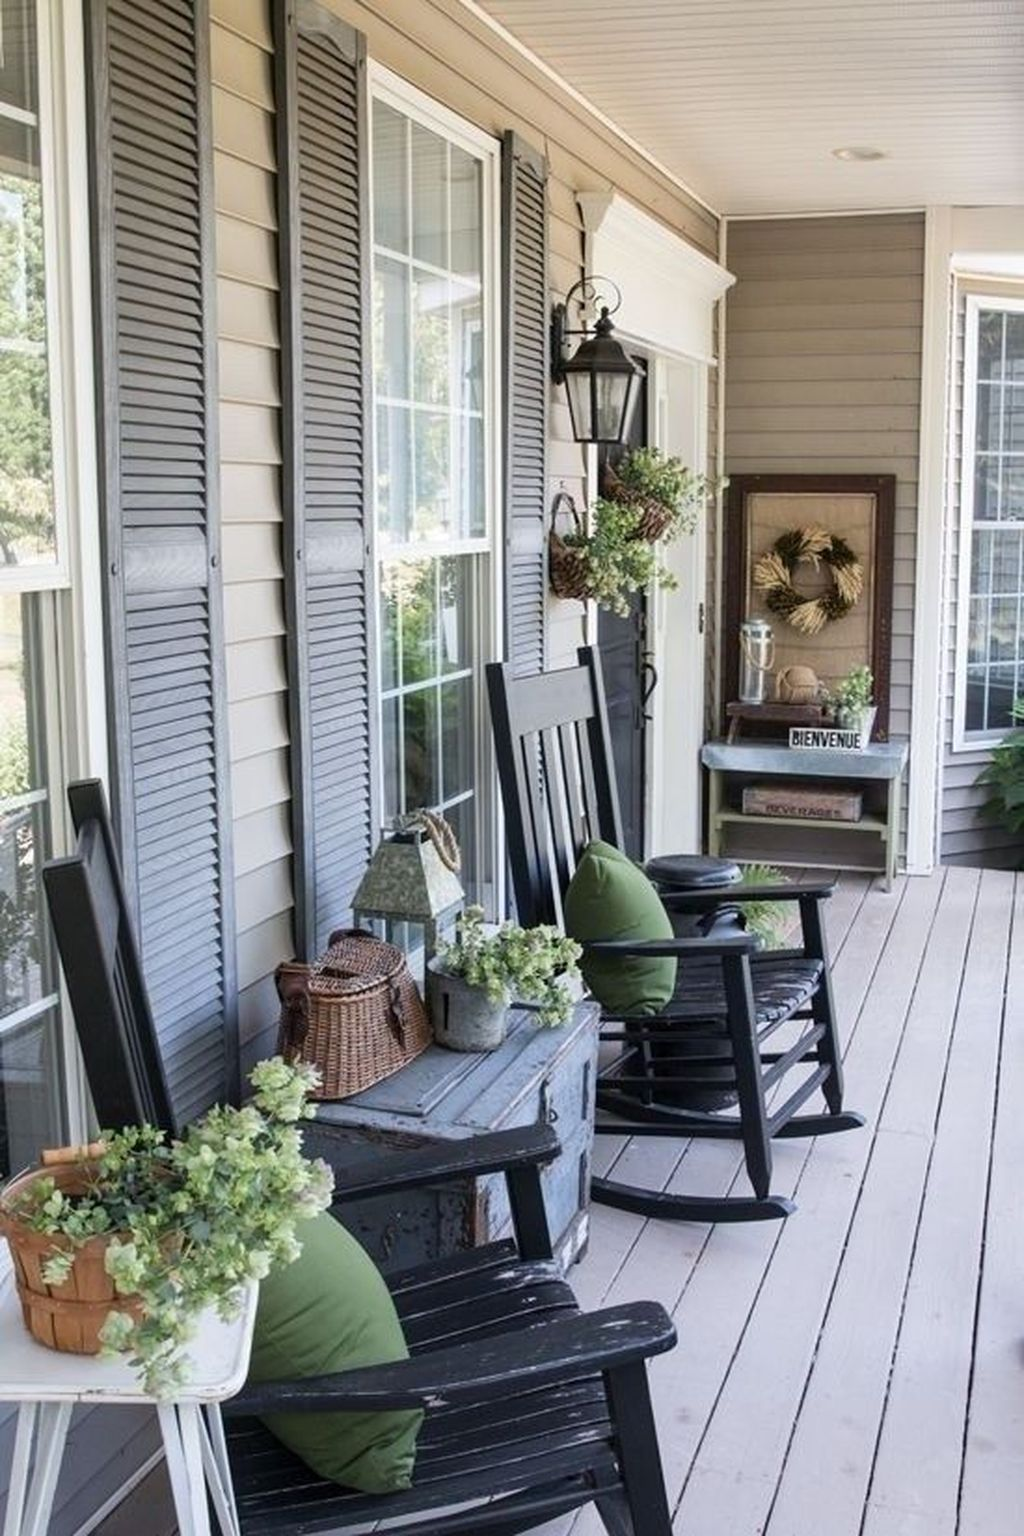 50 modern diy spring front porch decor ideas in 2020